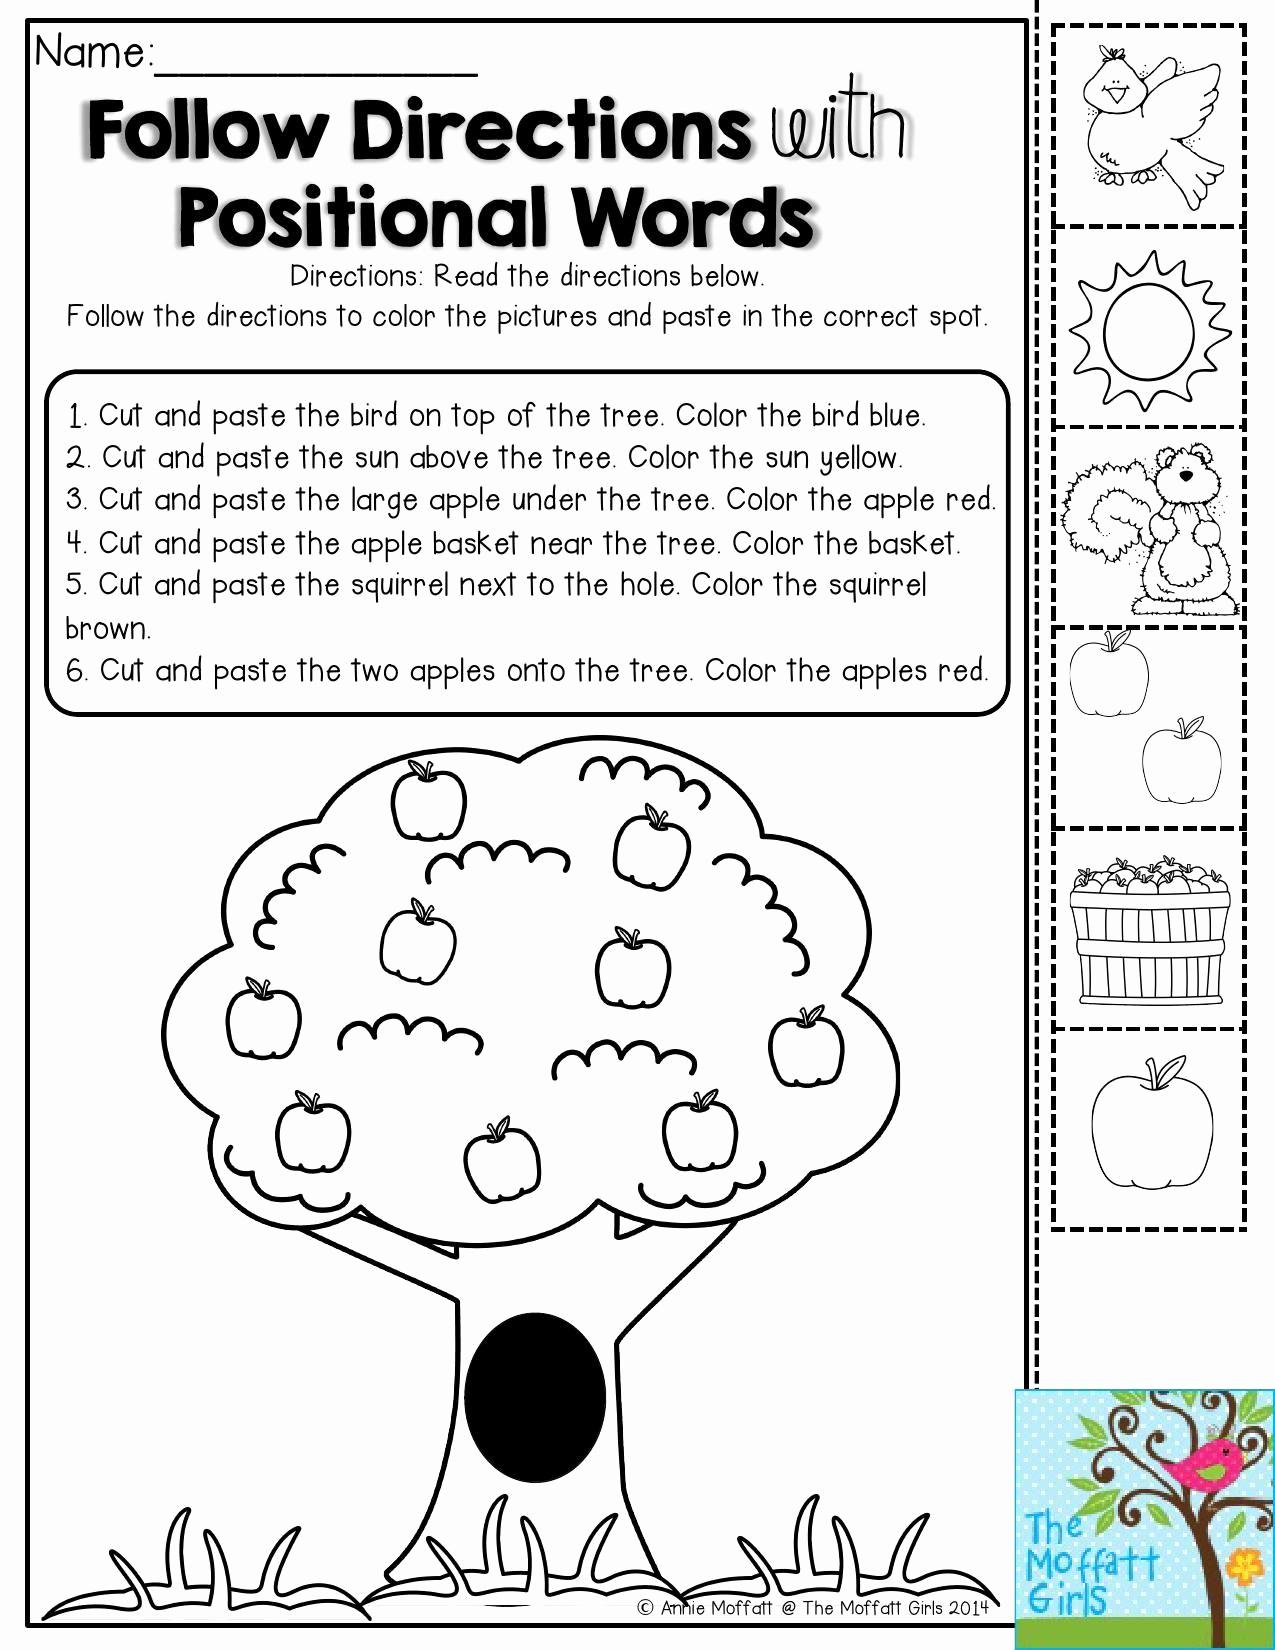 Positional Words Preschool Worksheets Luxury Back to School Packets